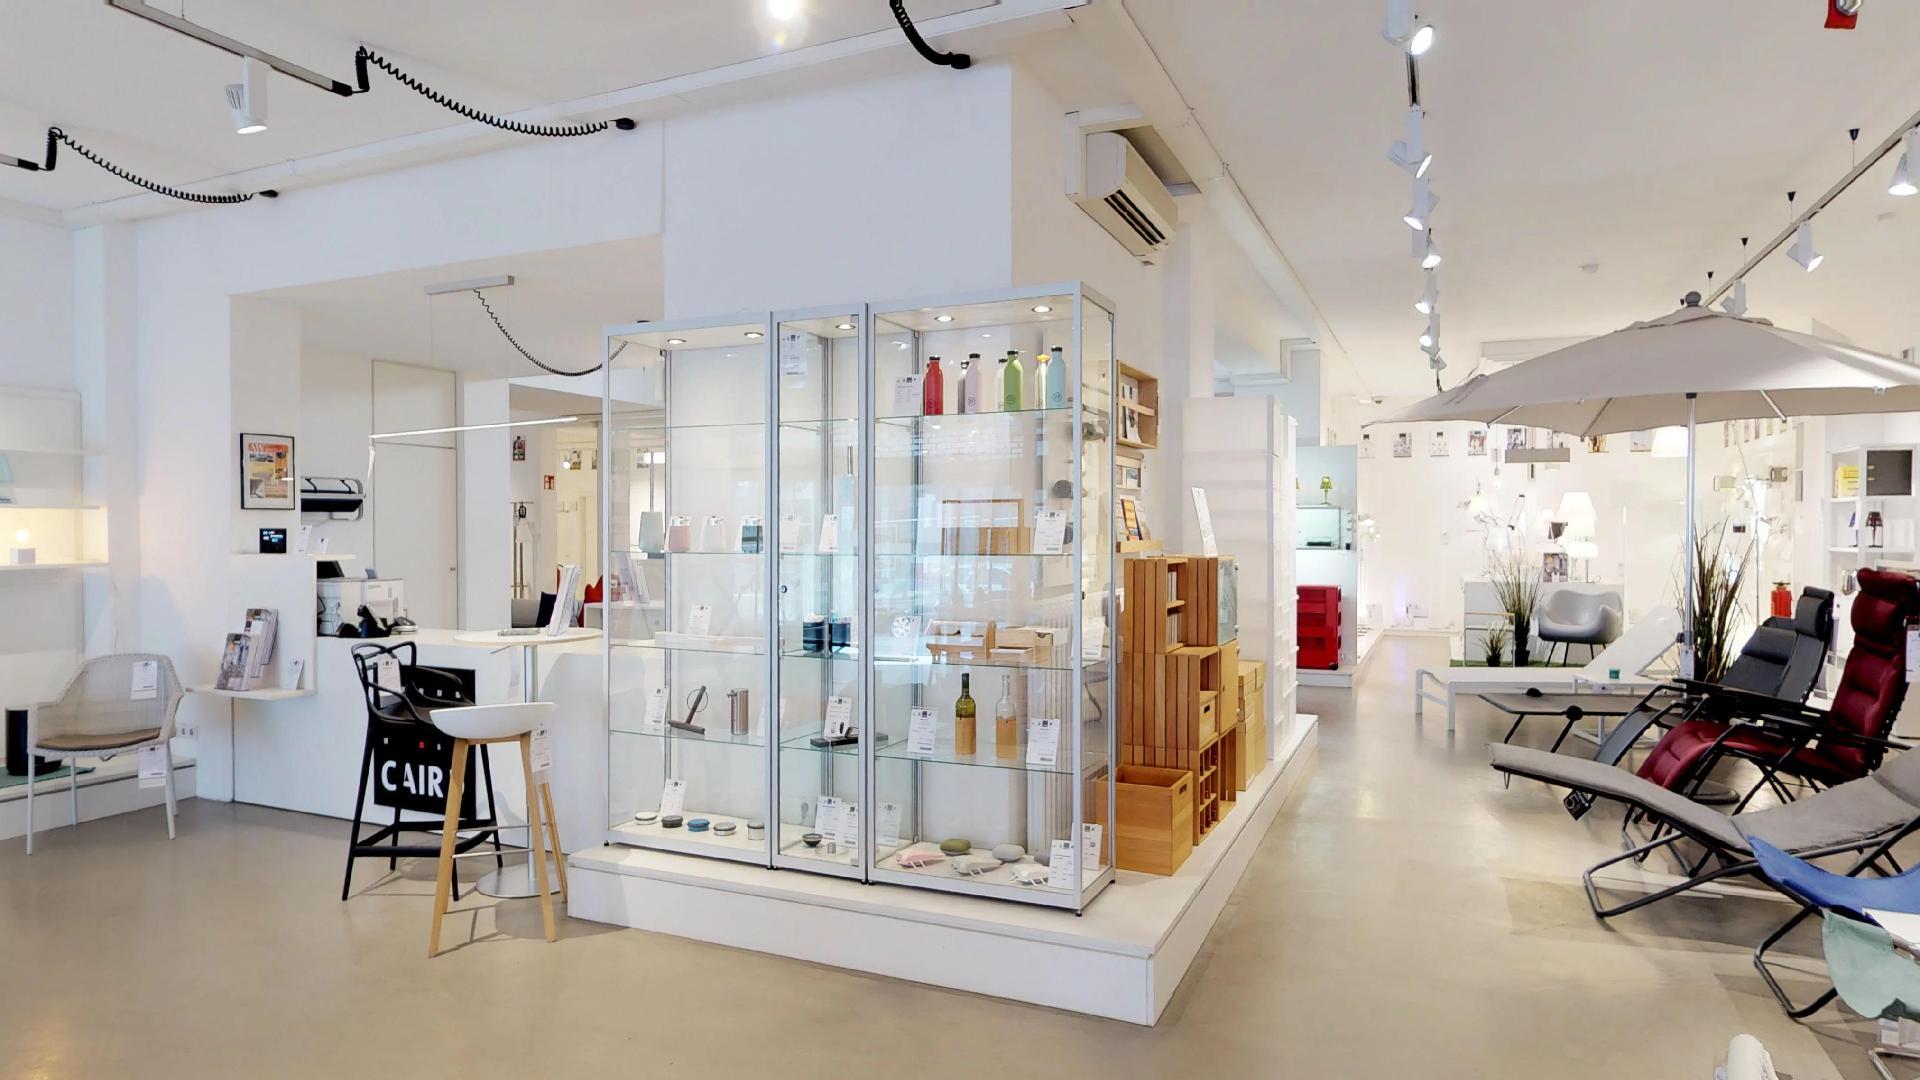 Cairo Designstore Frankfurt